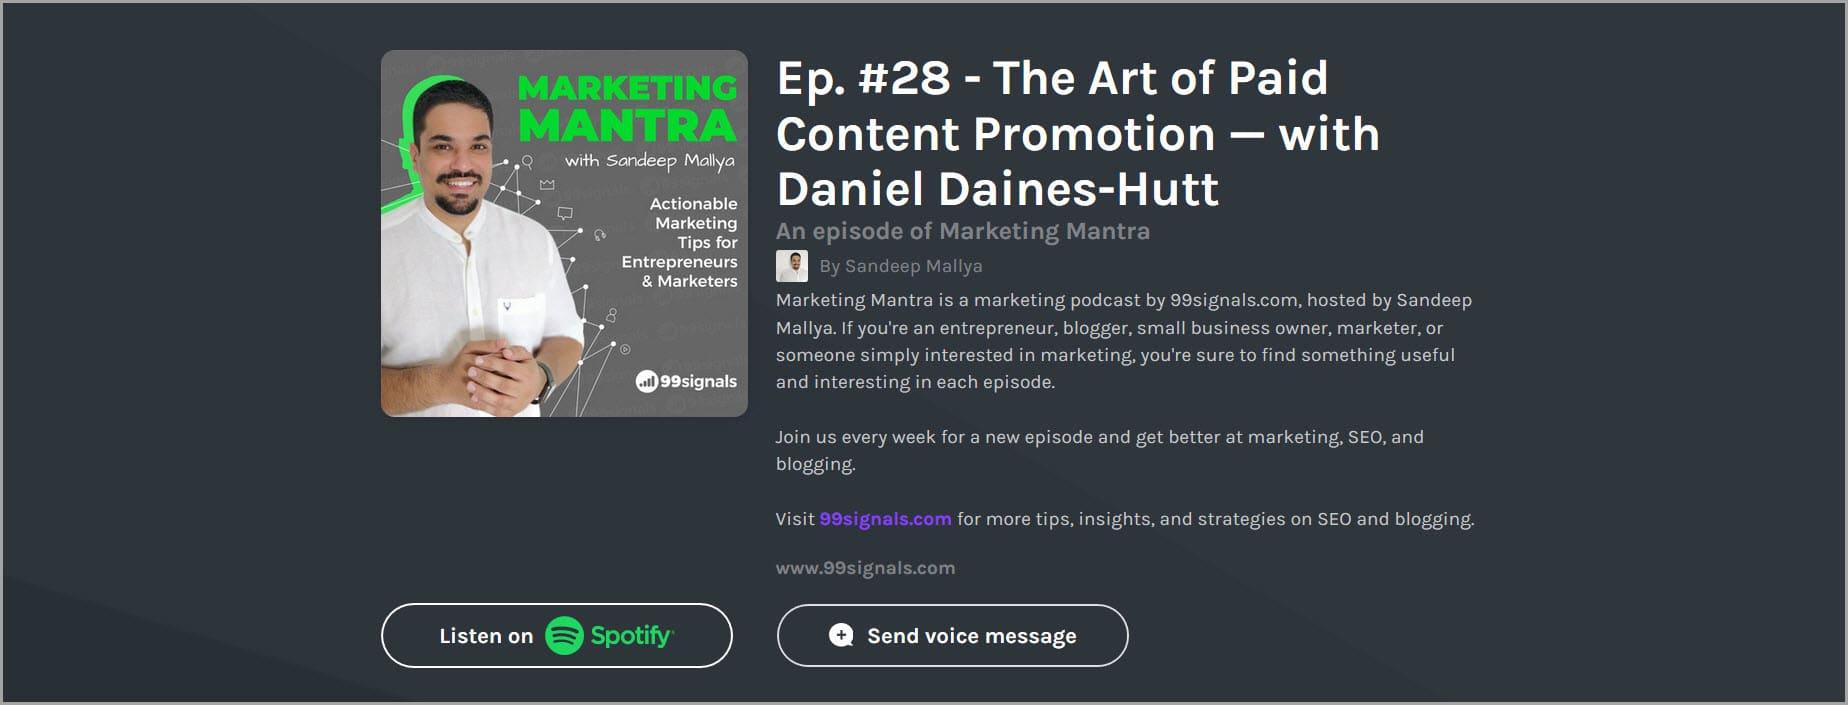 Marketing Mantra Podcast Ep. #28